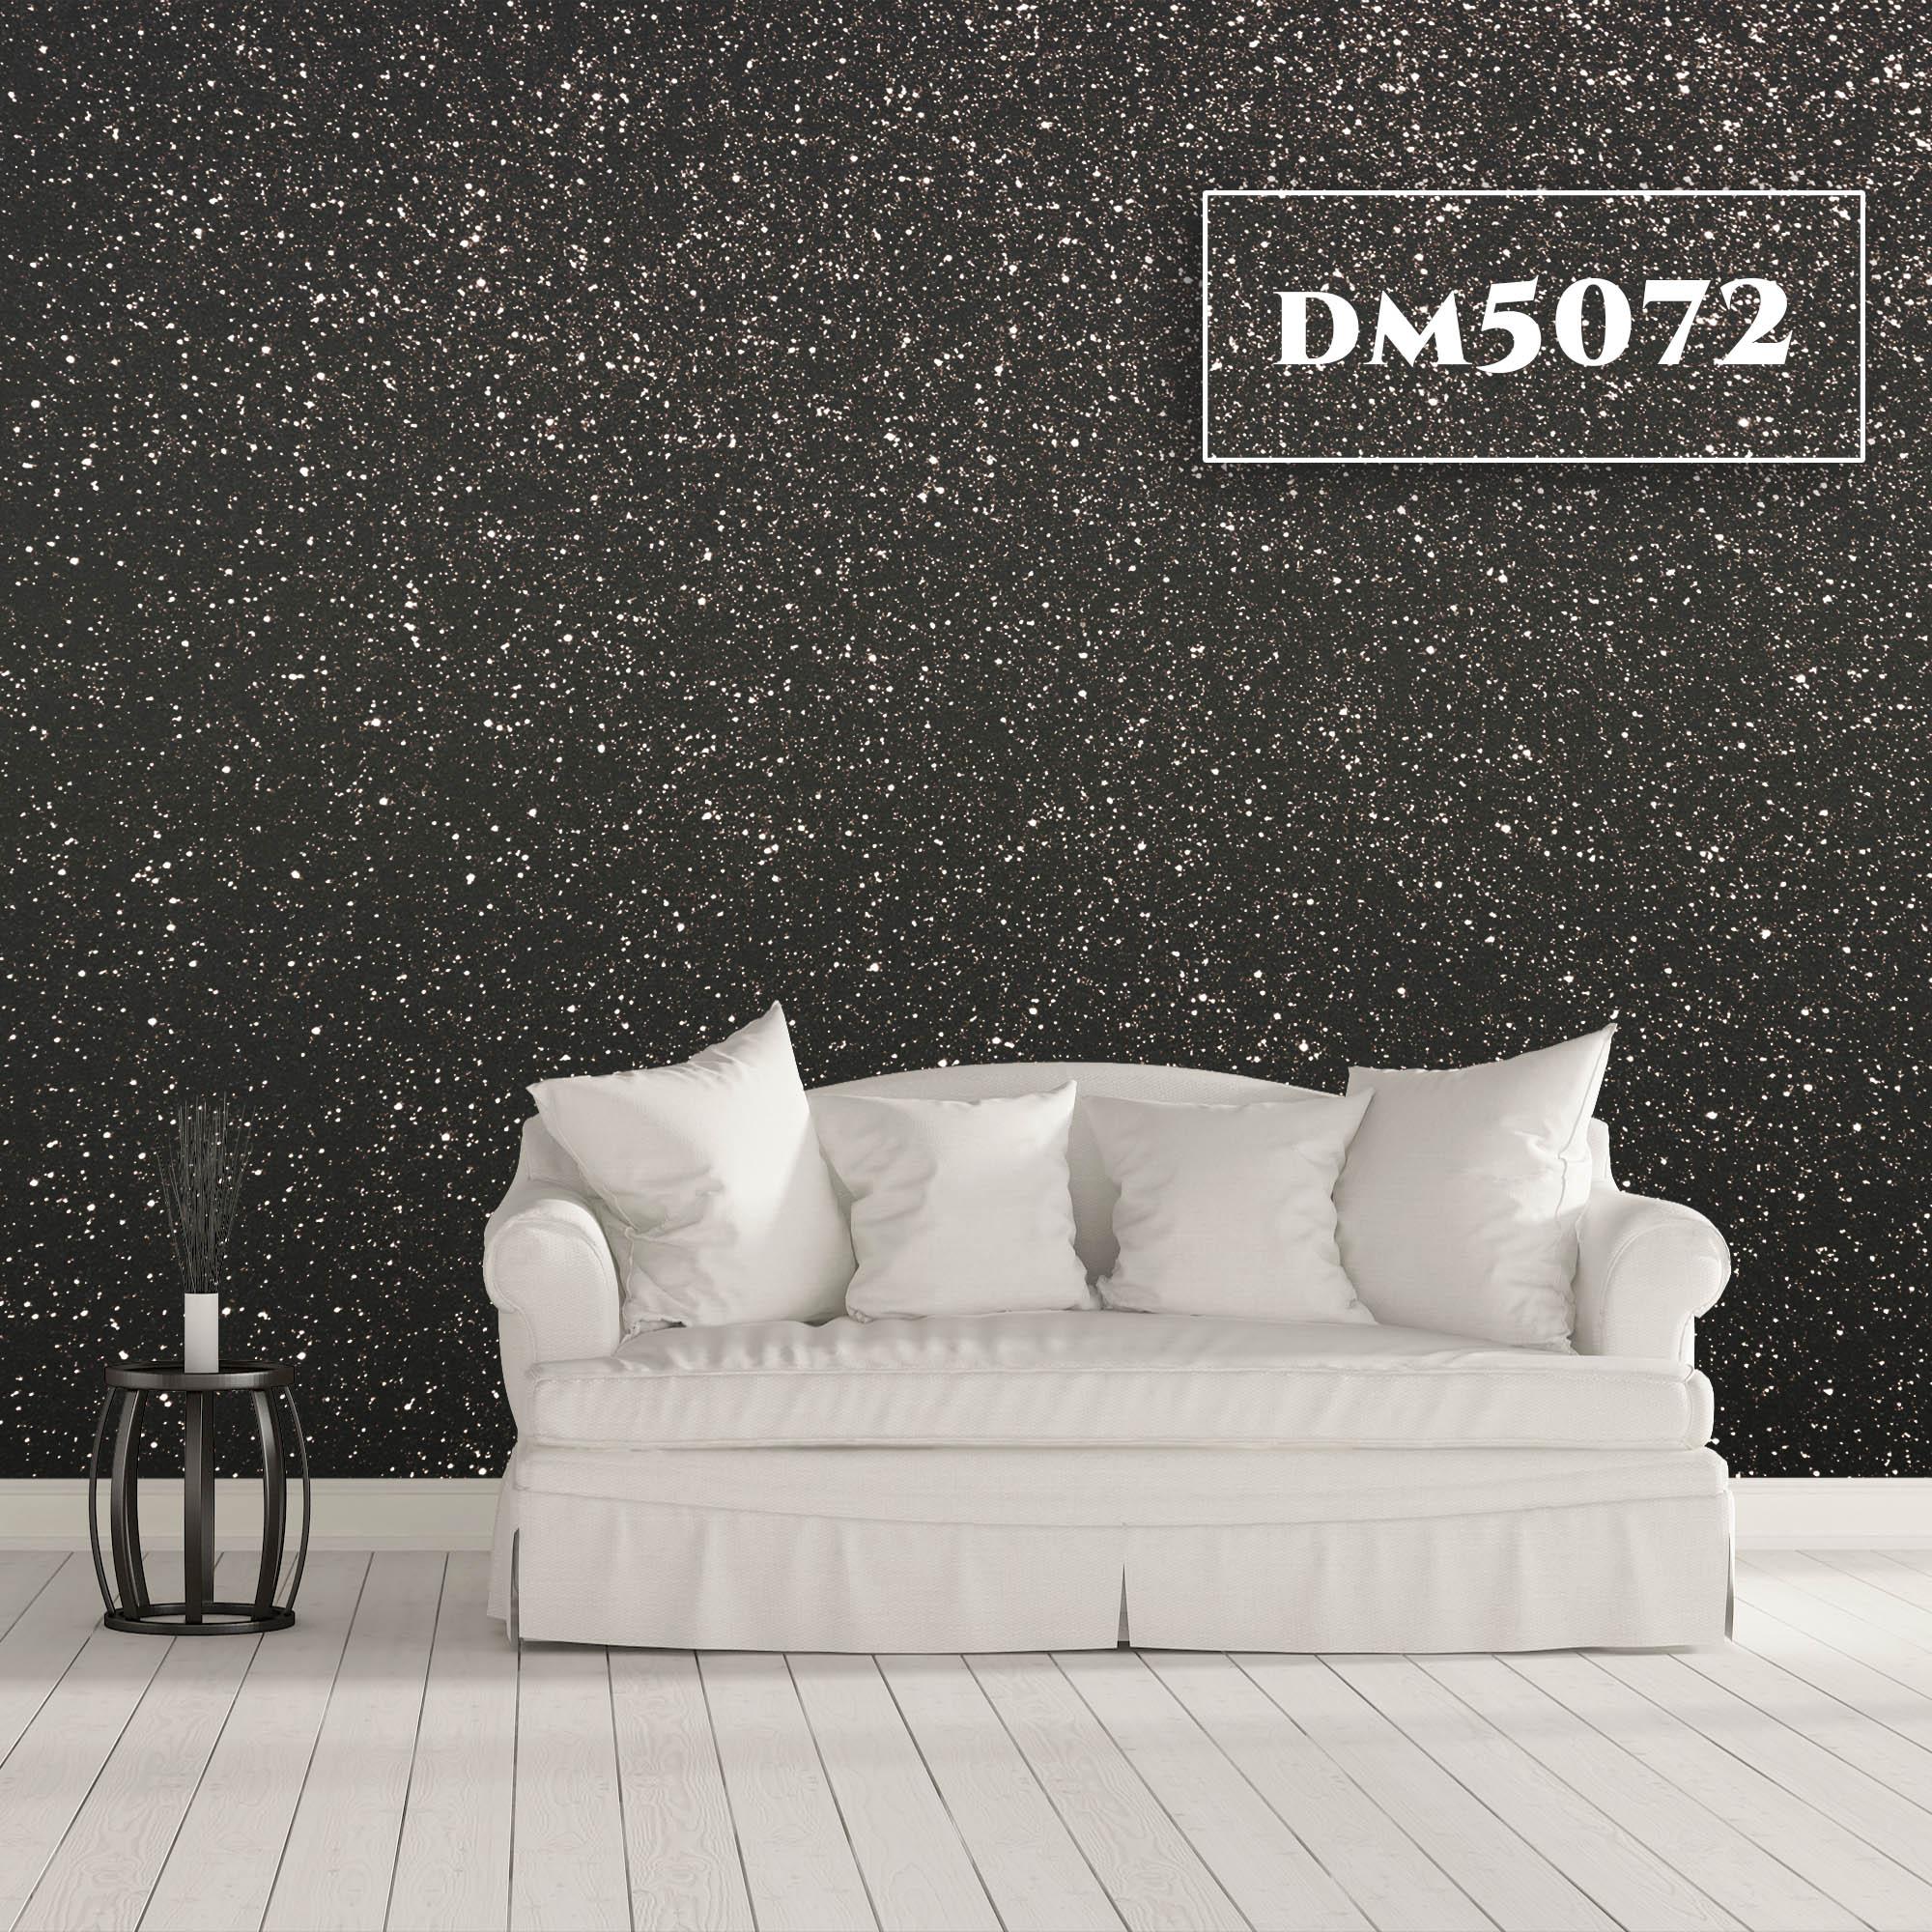 DM5072